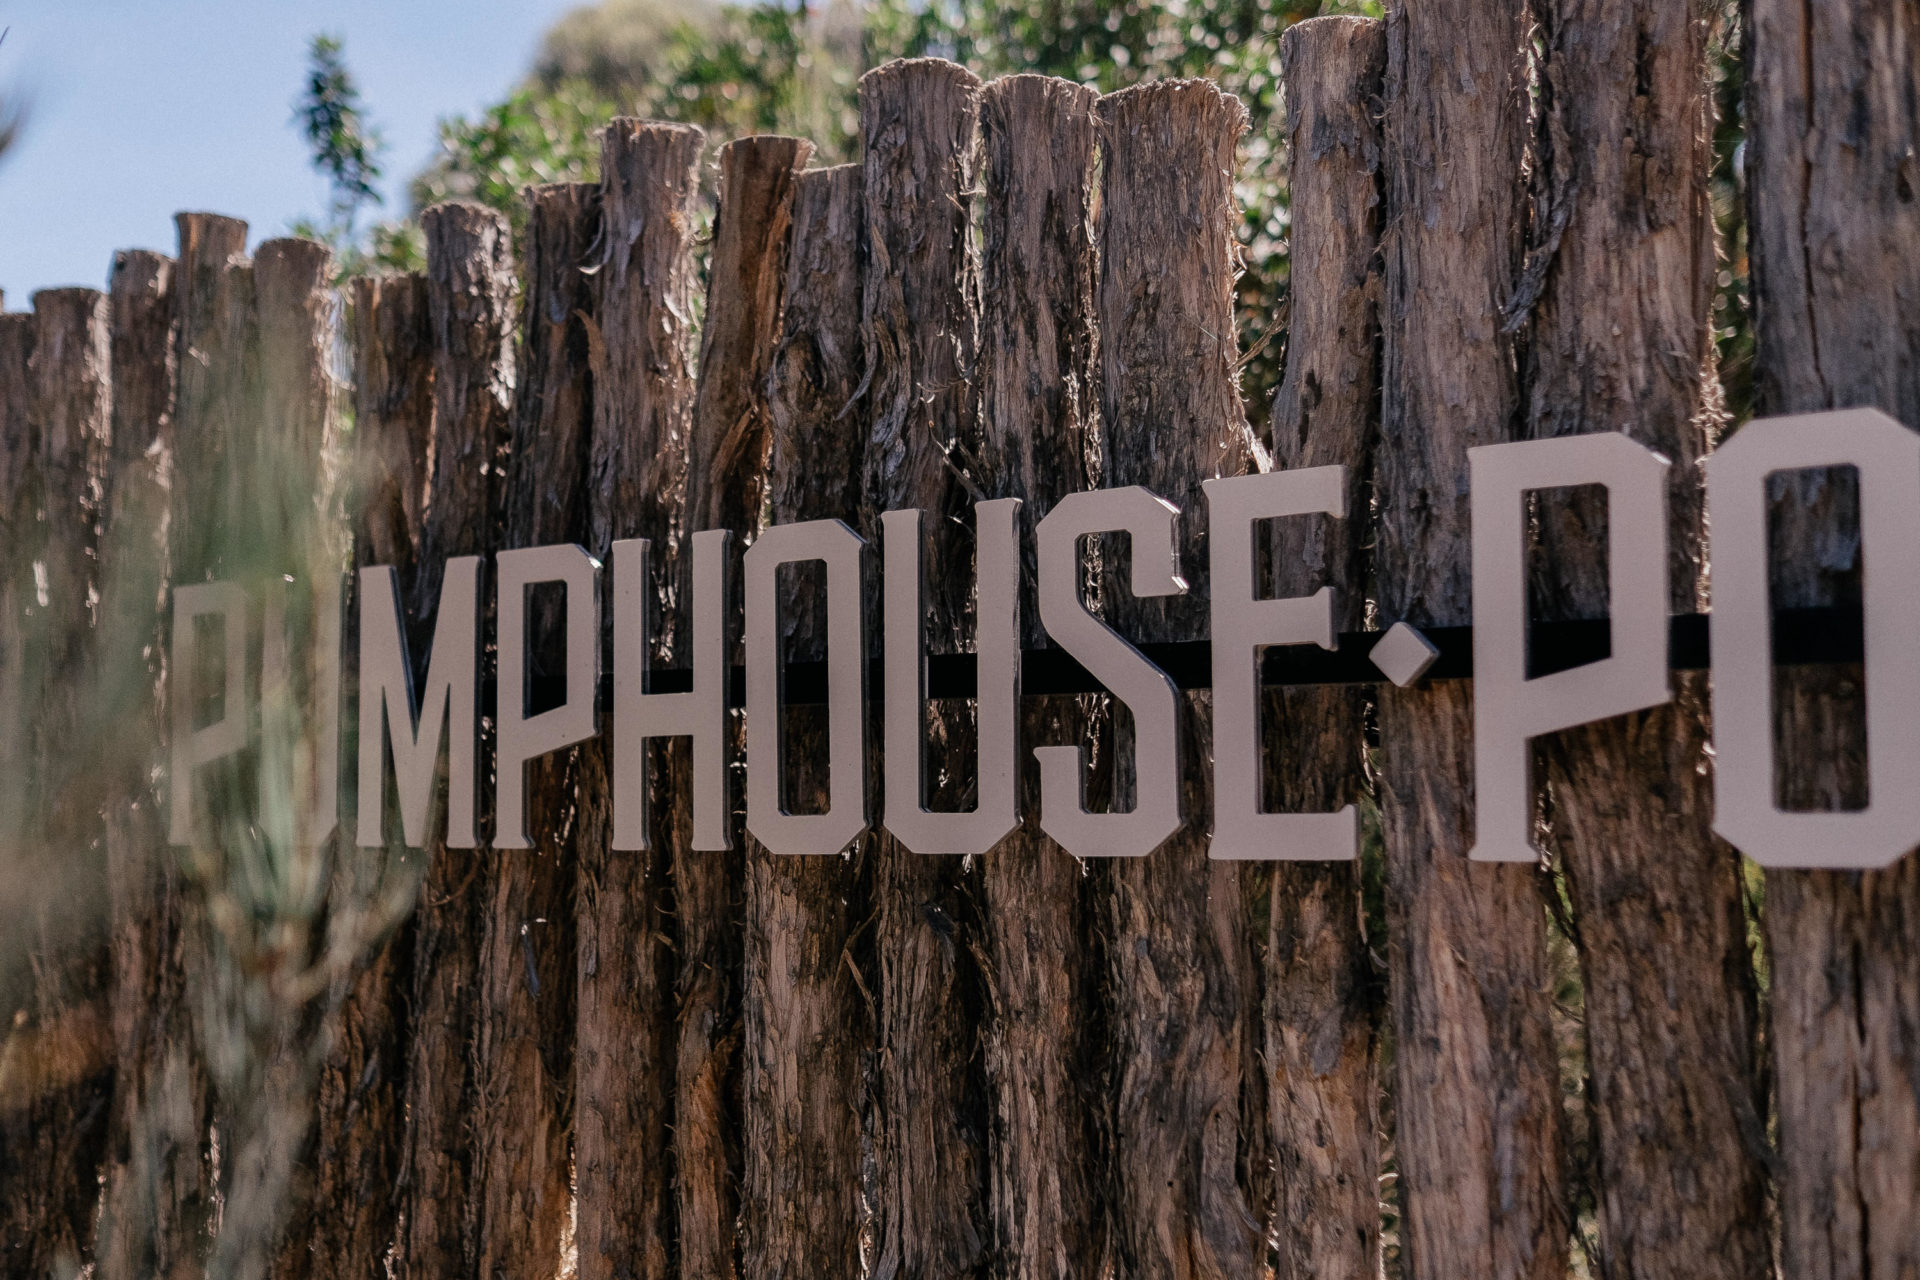 wedding-location-tasmania-design-hotel-lake-st-clair-pumphouse-point-honeymoon-holiday-no-children-wilderness-retreat